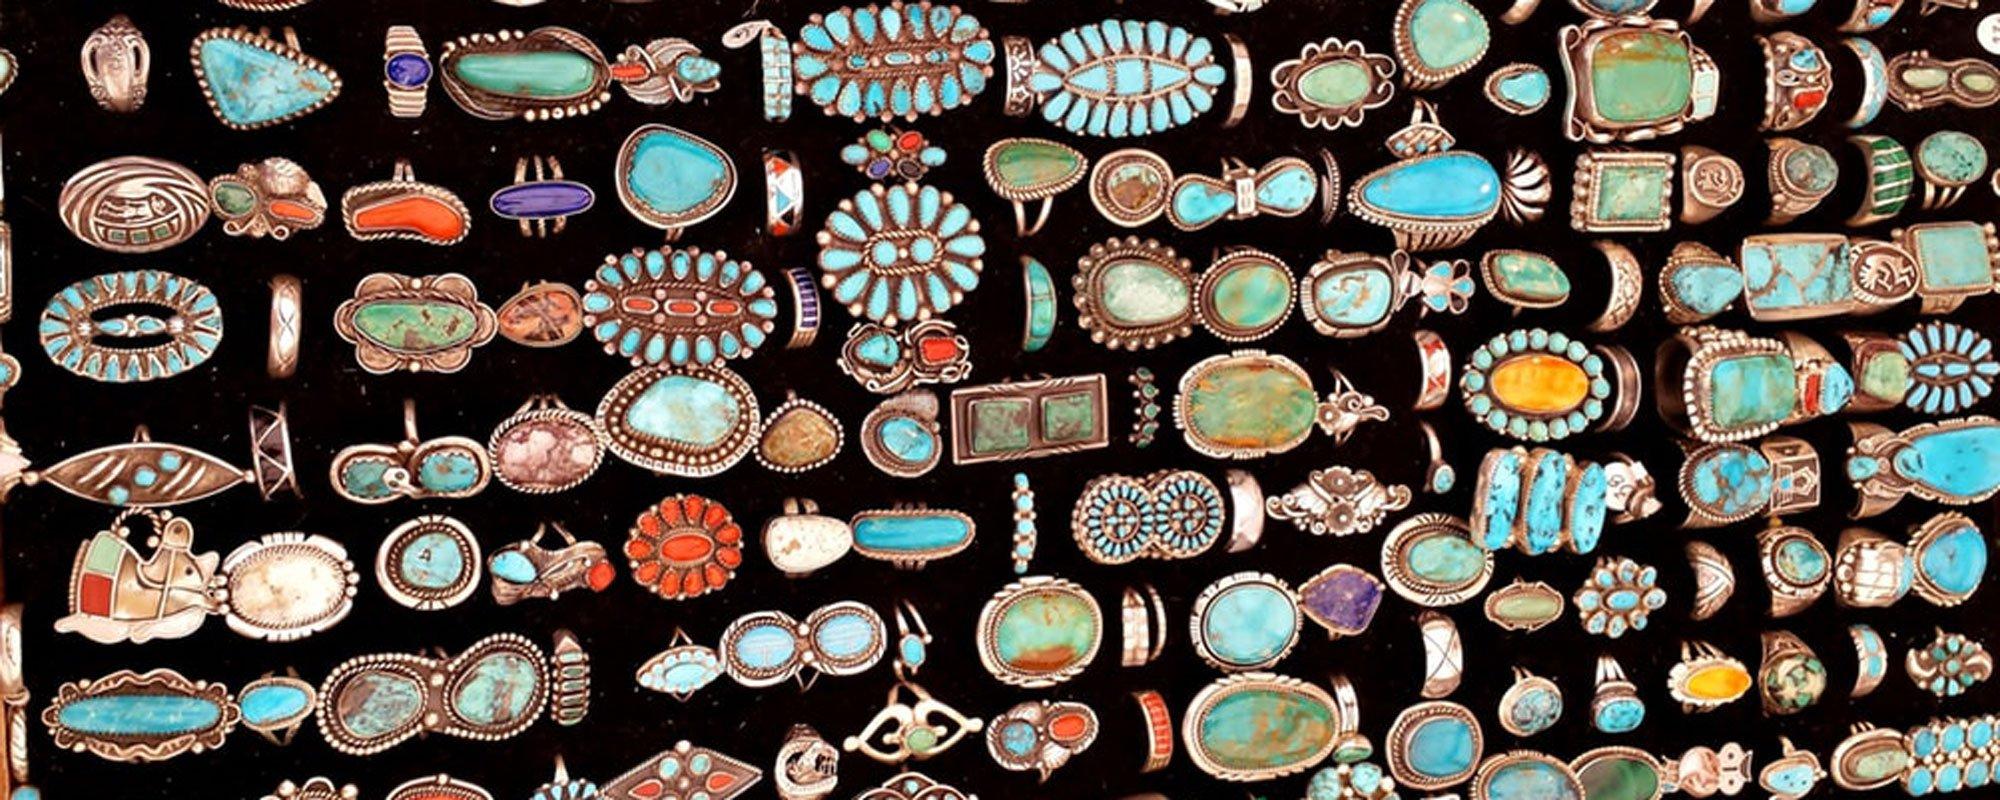 turquoise jewelry display